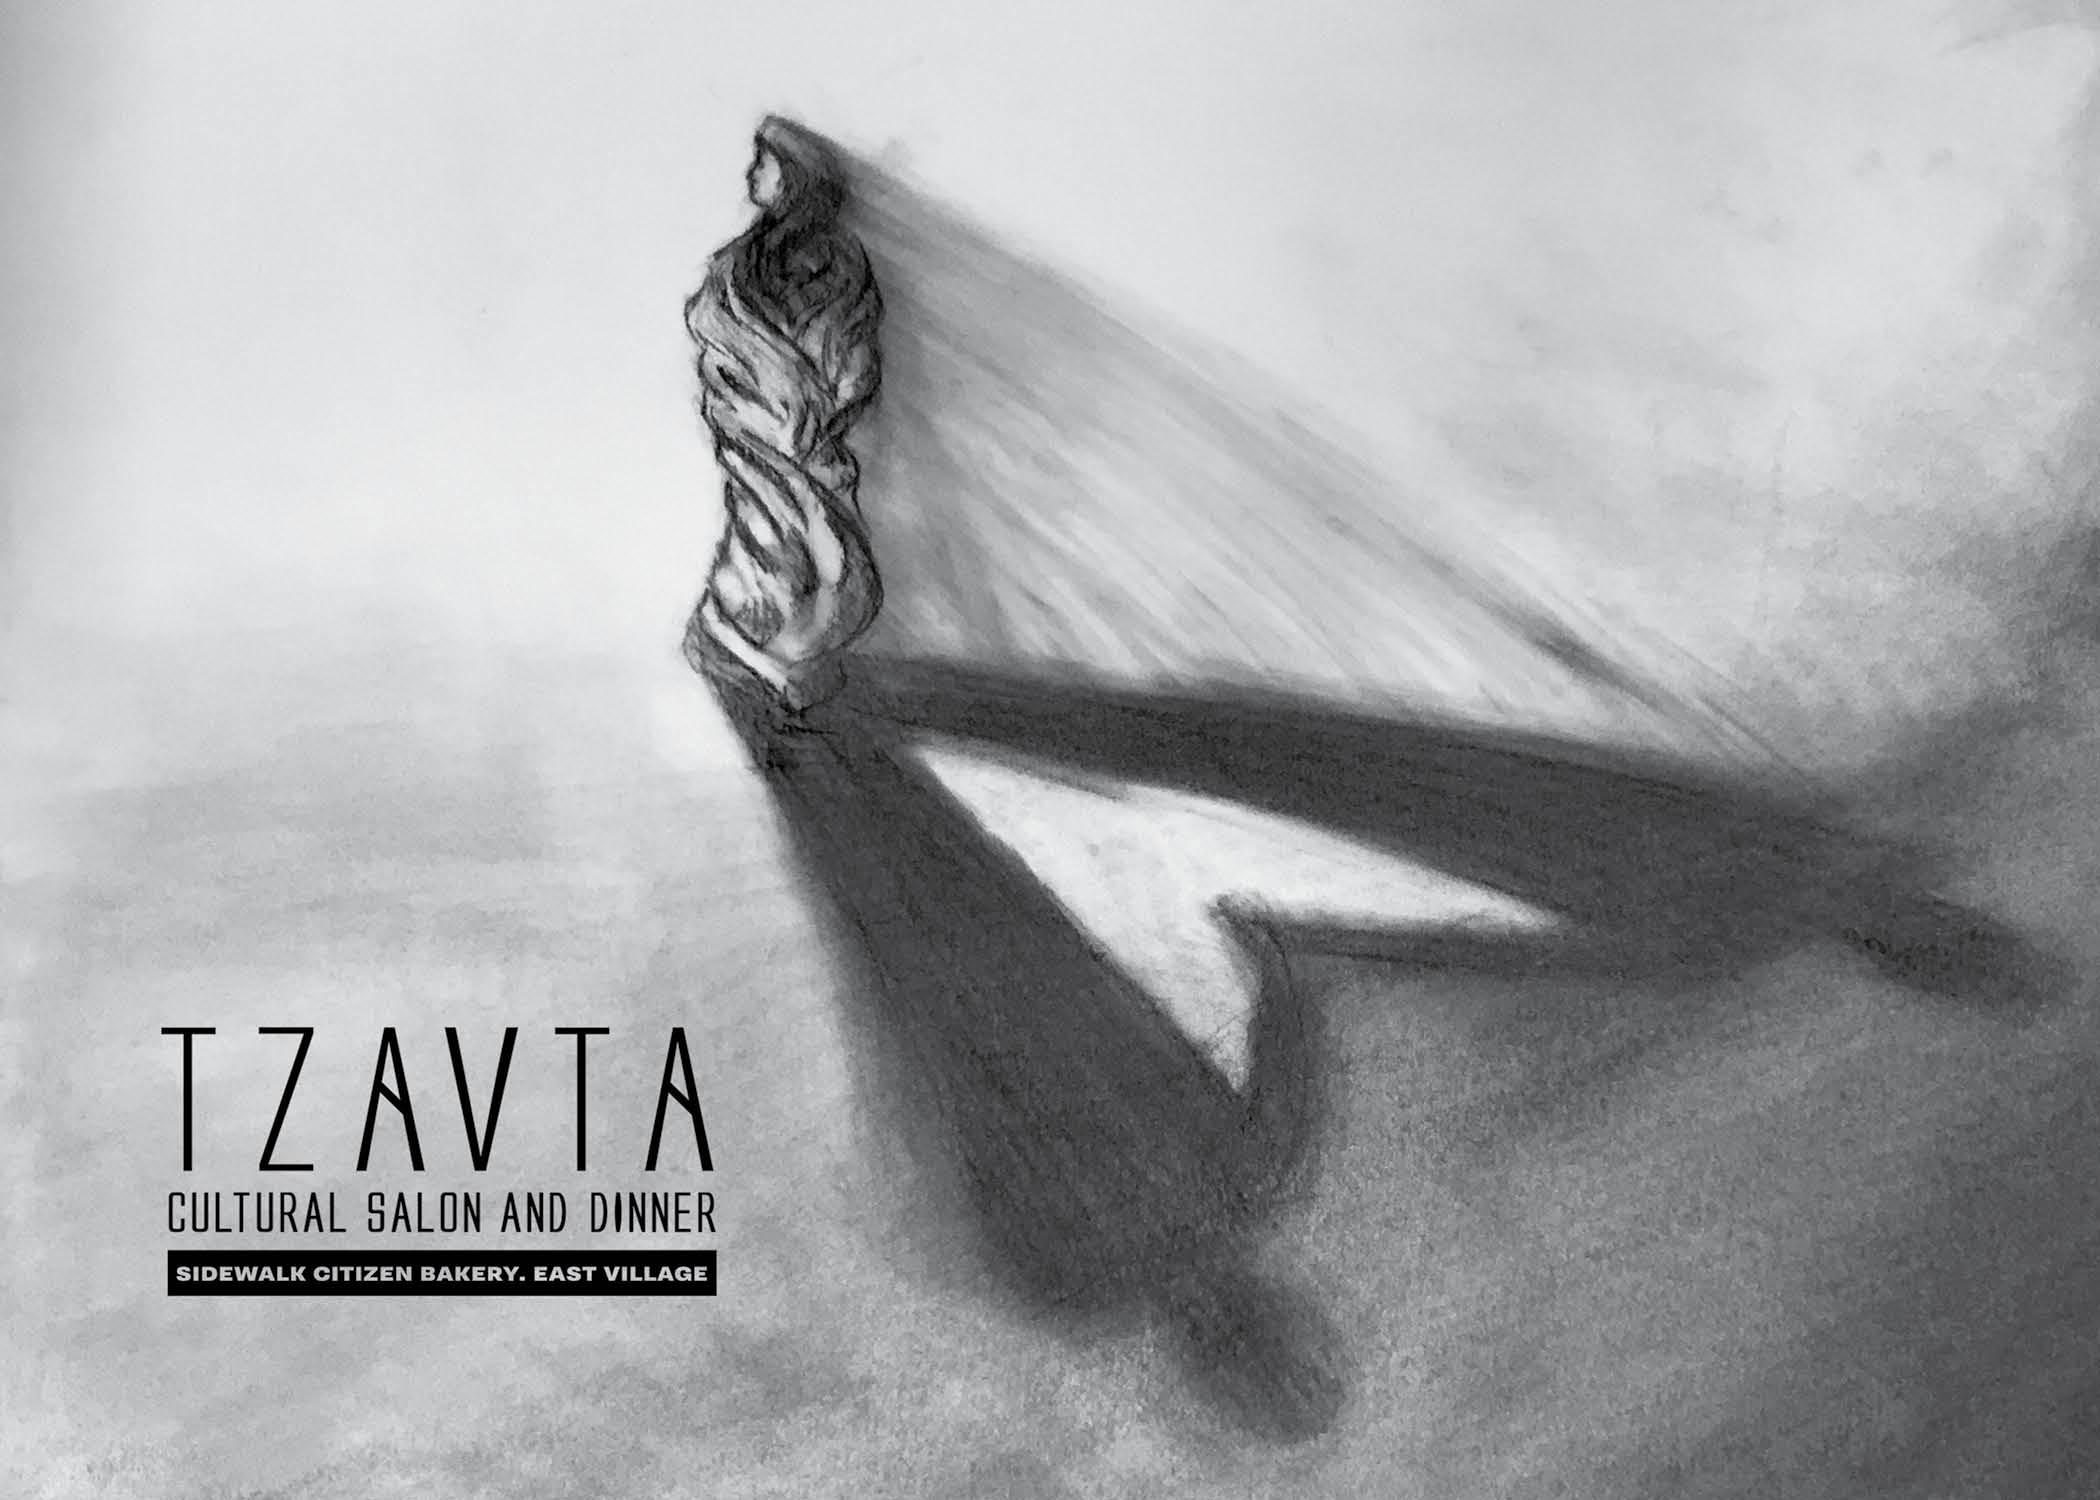 TZAVTA #11